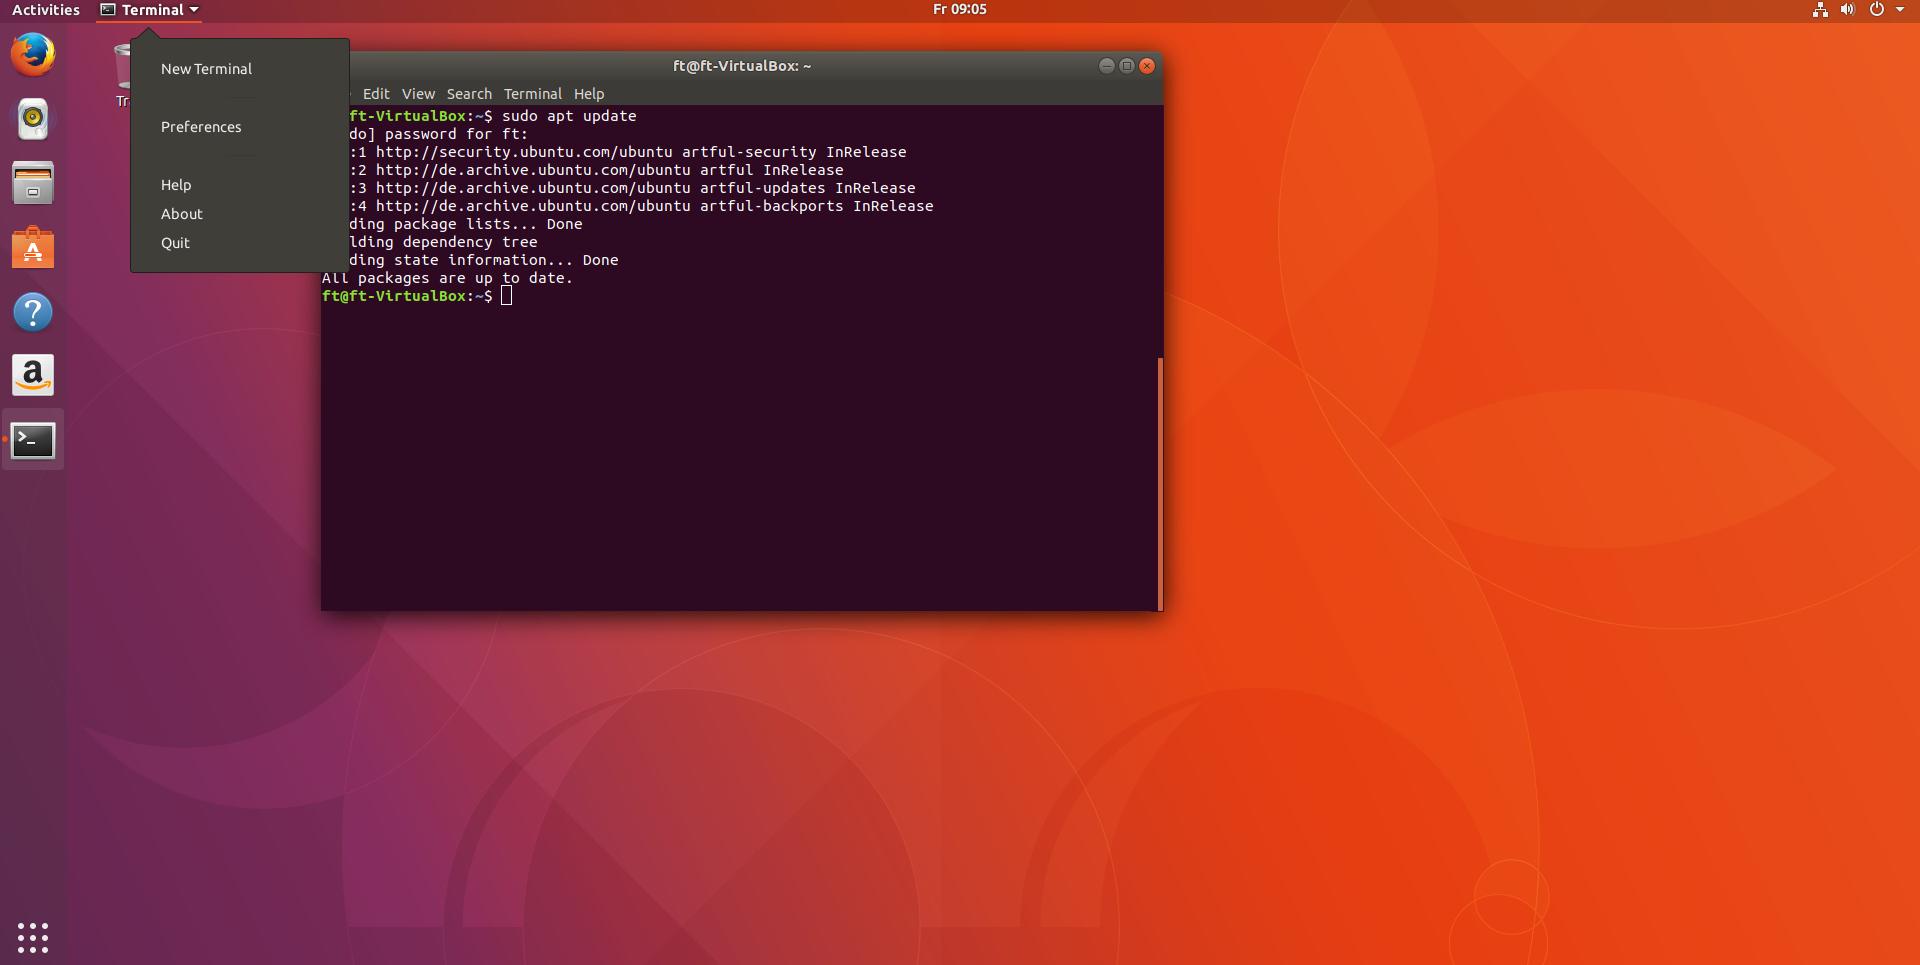 12946 ubuntu 1710 Beta 2 moreover Best Brunch In Nyc together with 29761 Mr Wong Sydney likewise KL Sales also Dokumentasi Limbah B3. on mrwong